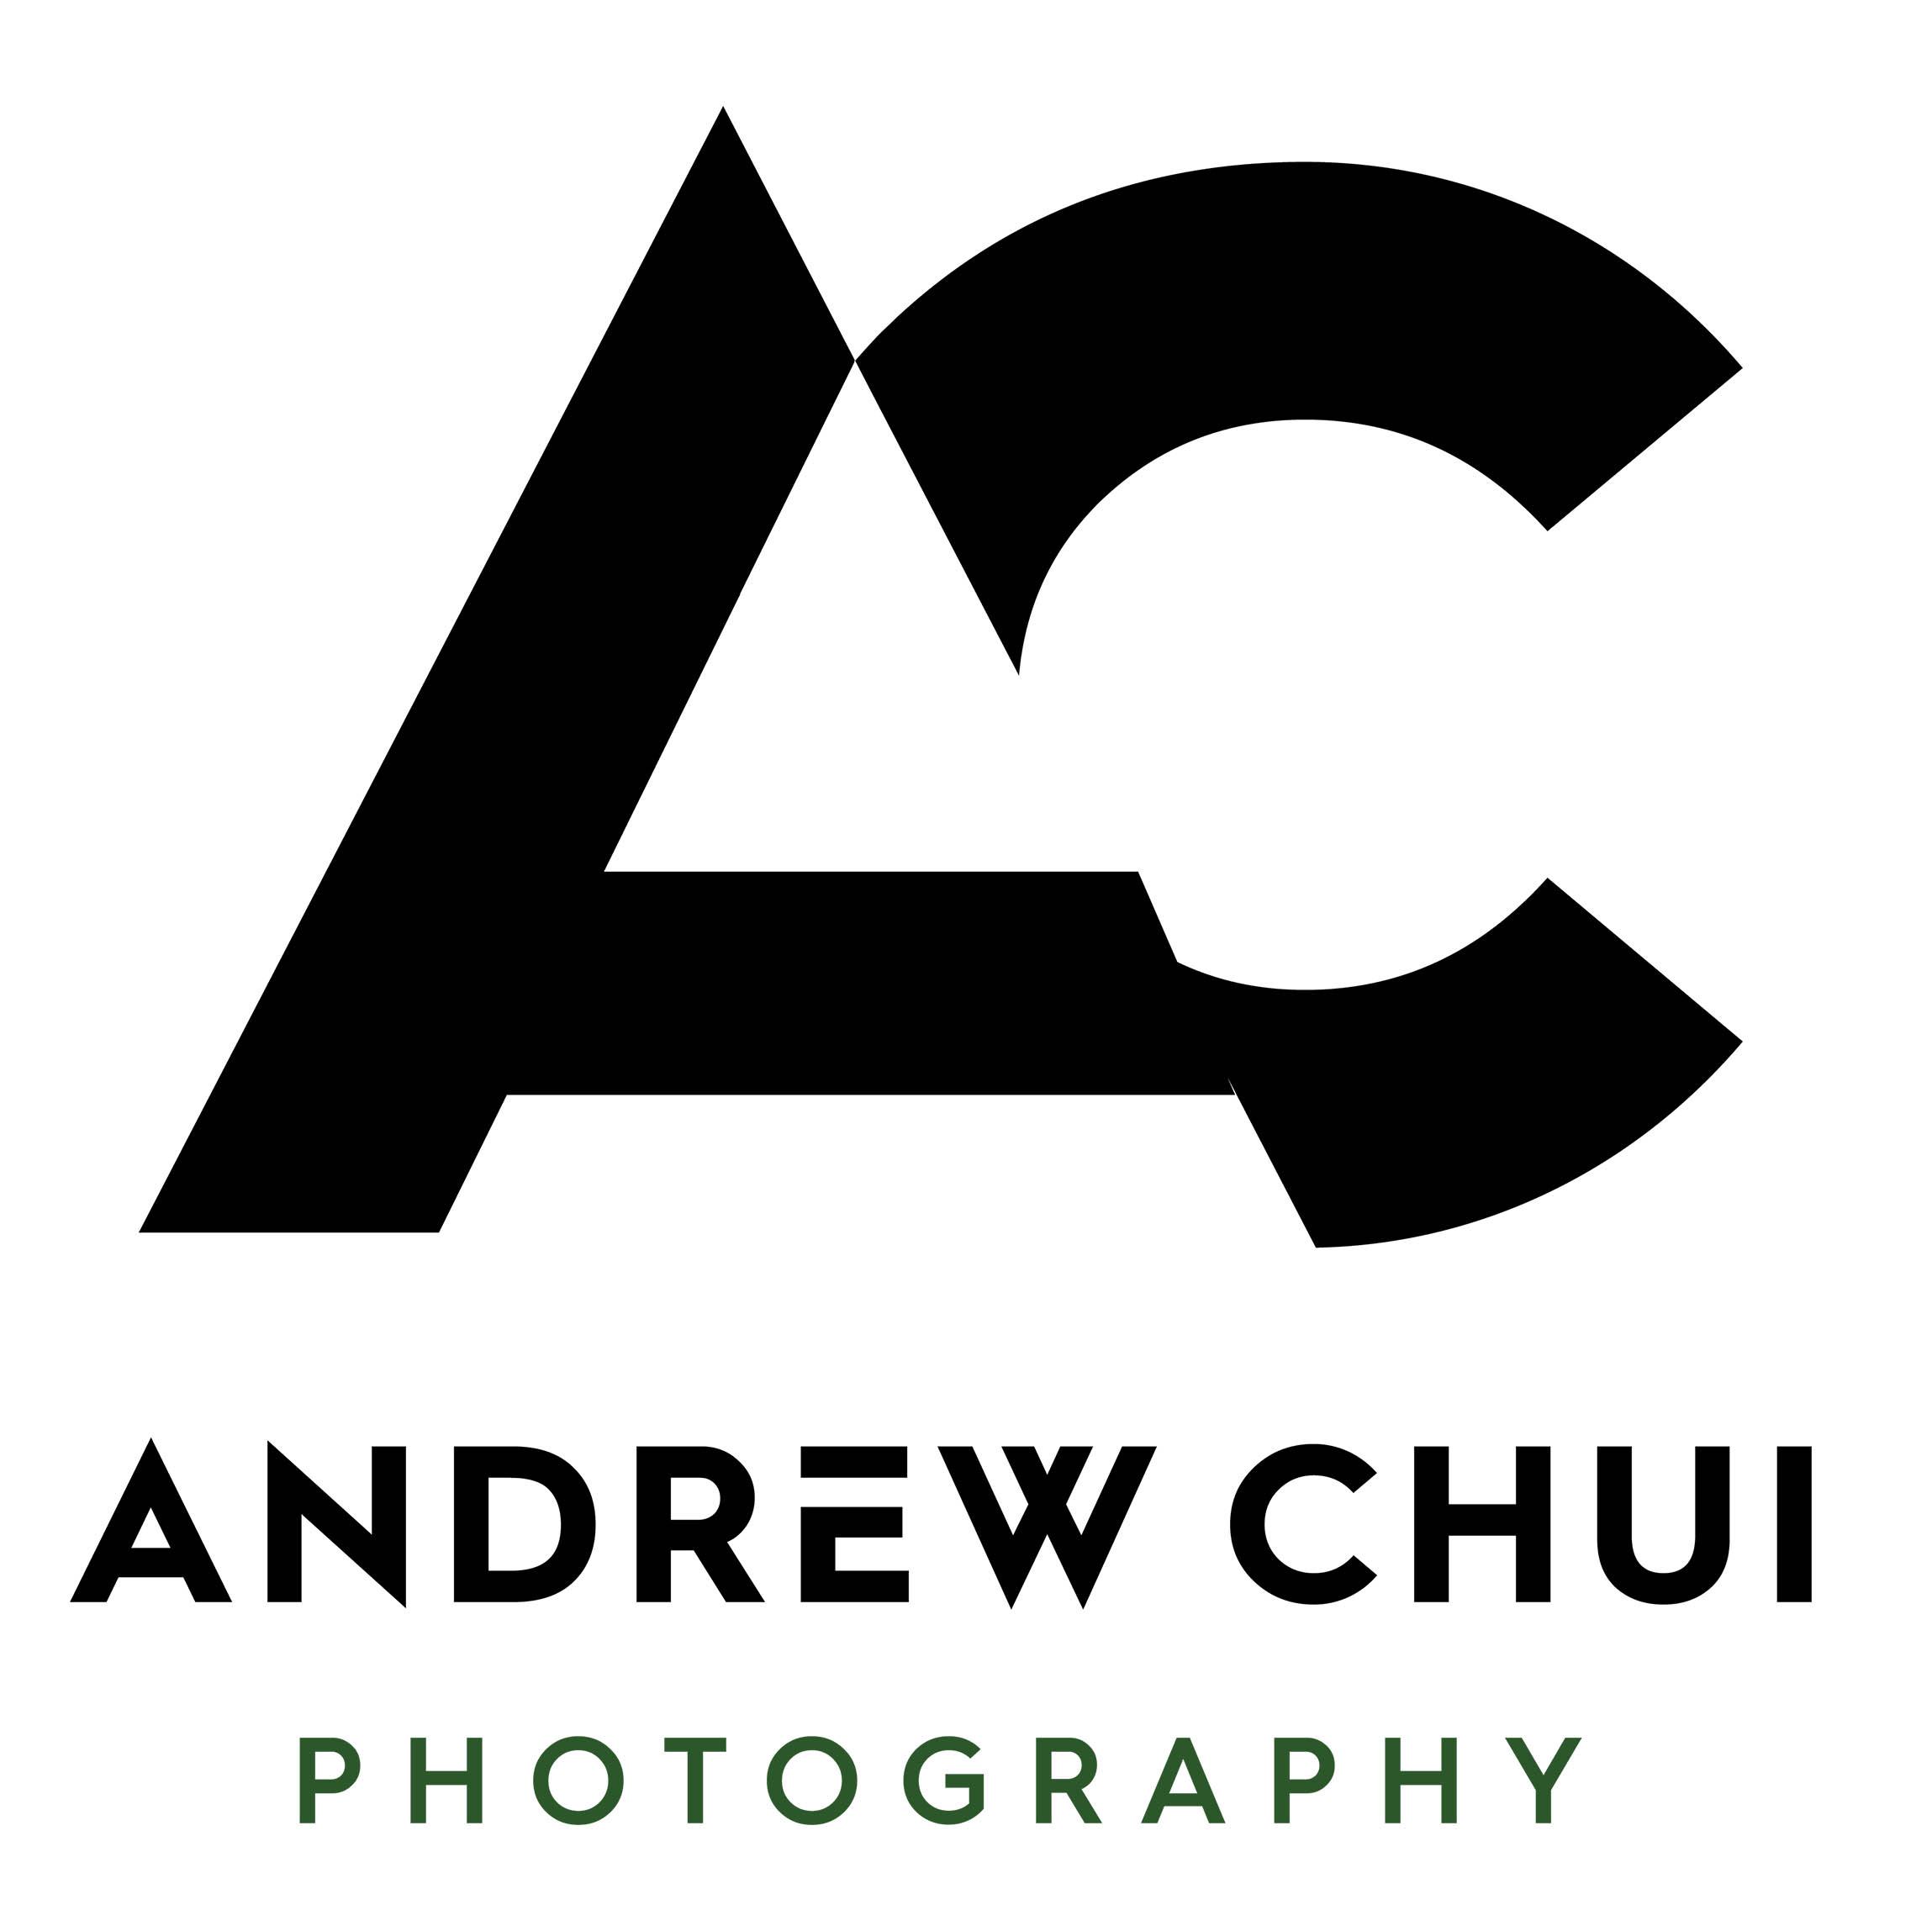 Andrew Chui Photography floor plan in Jersey City Newark New York